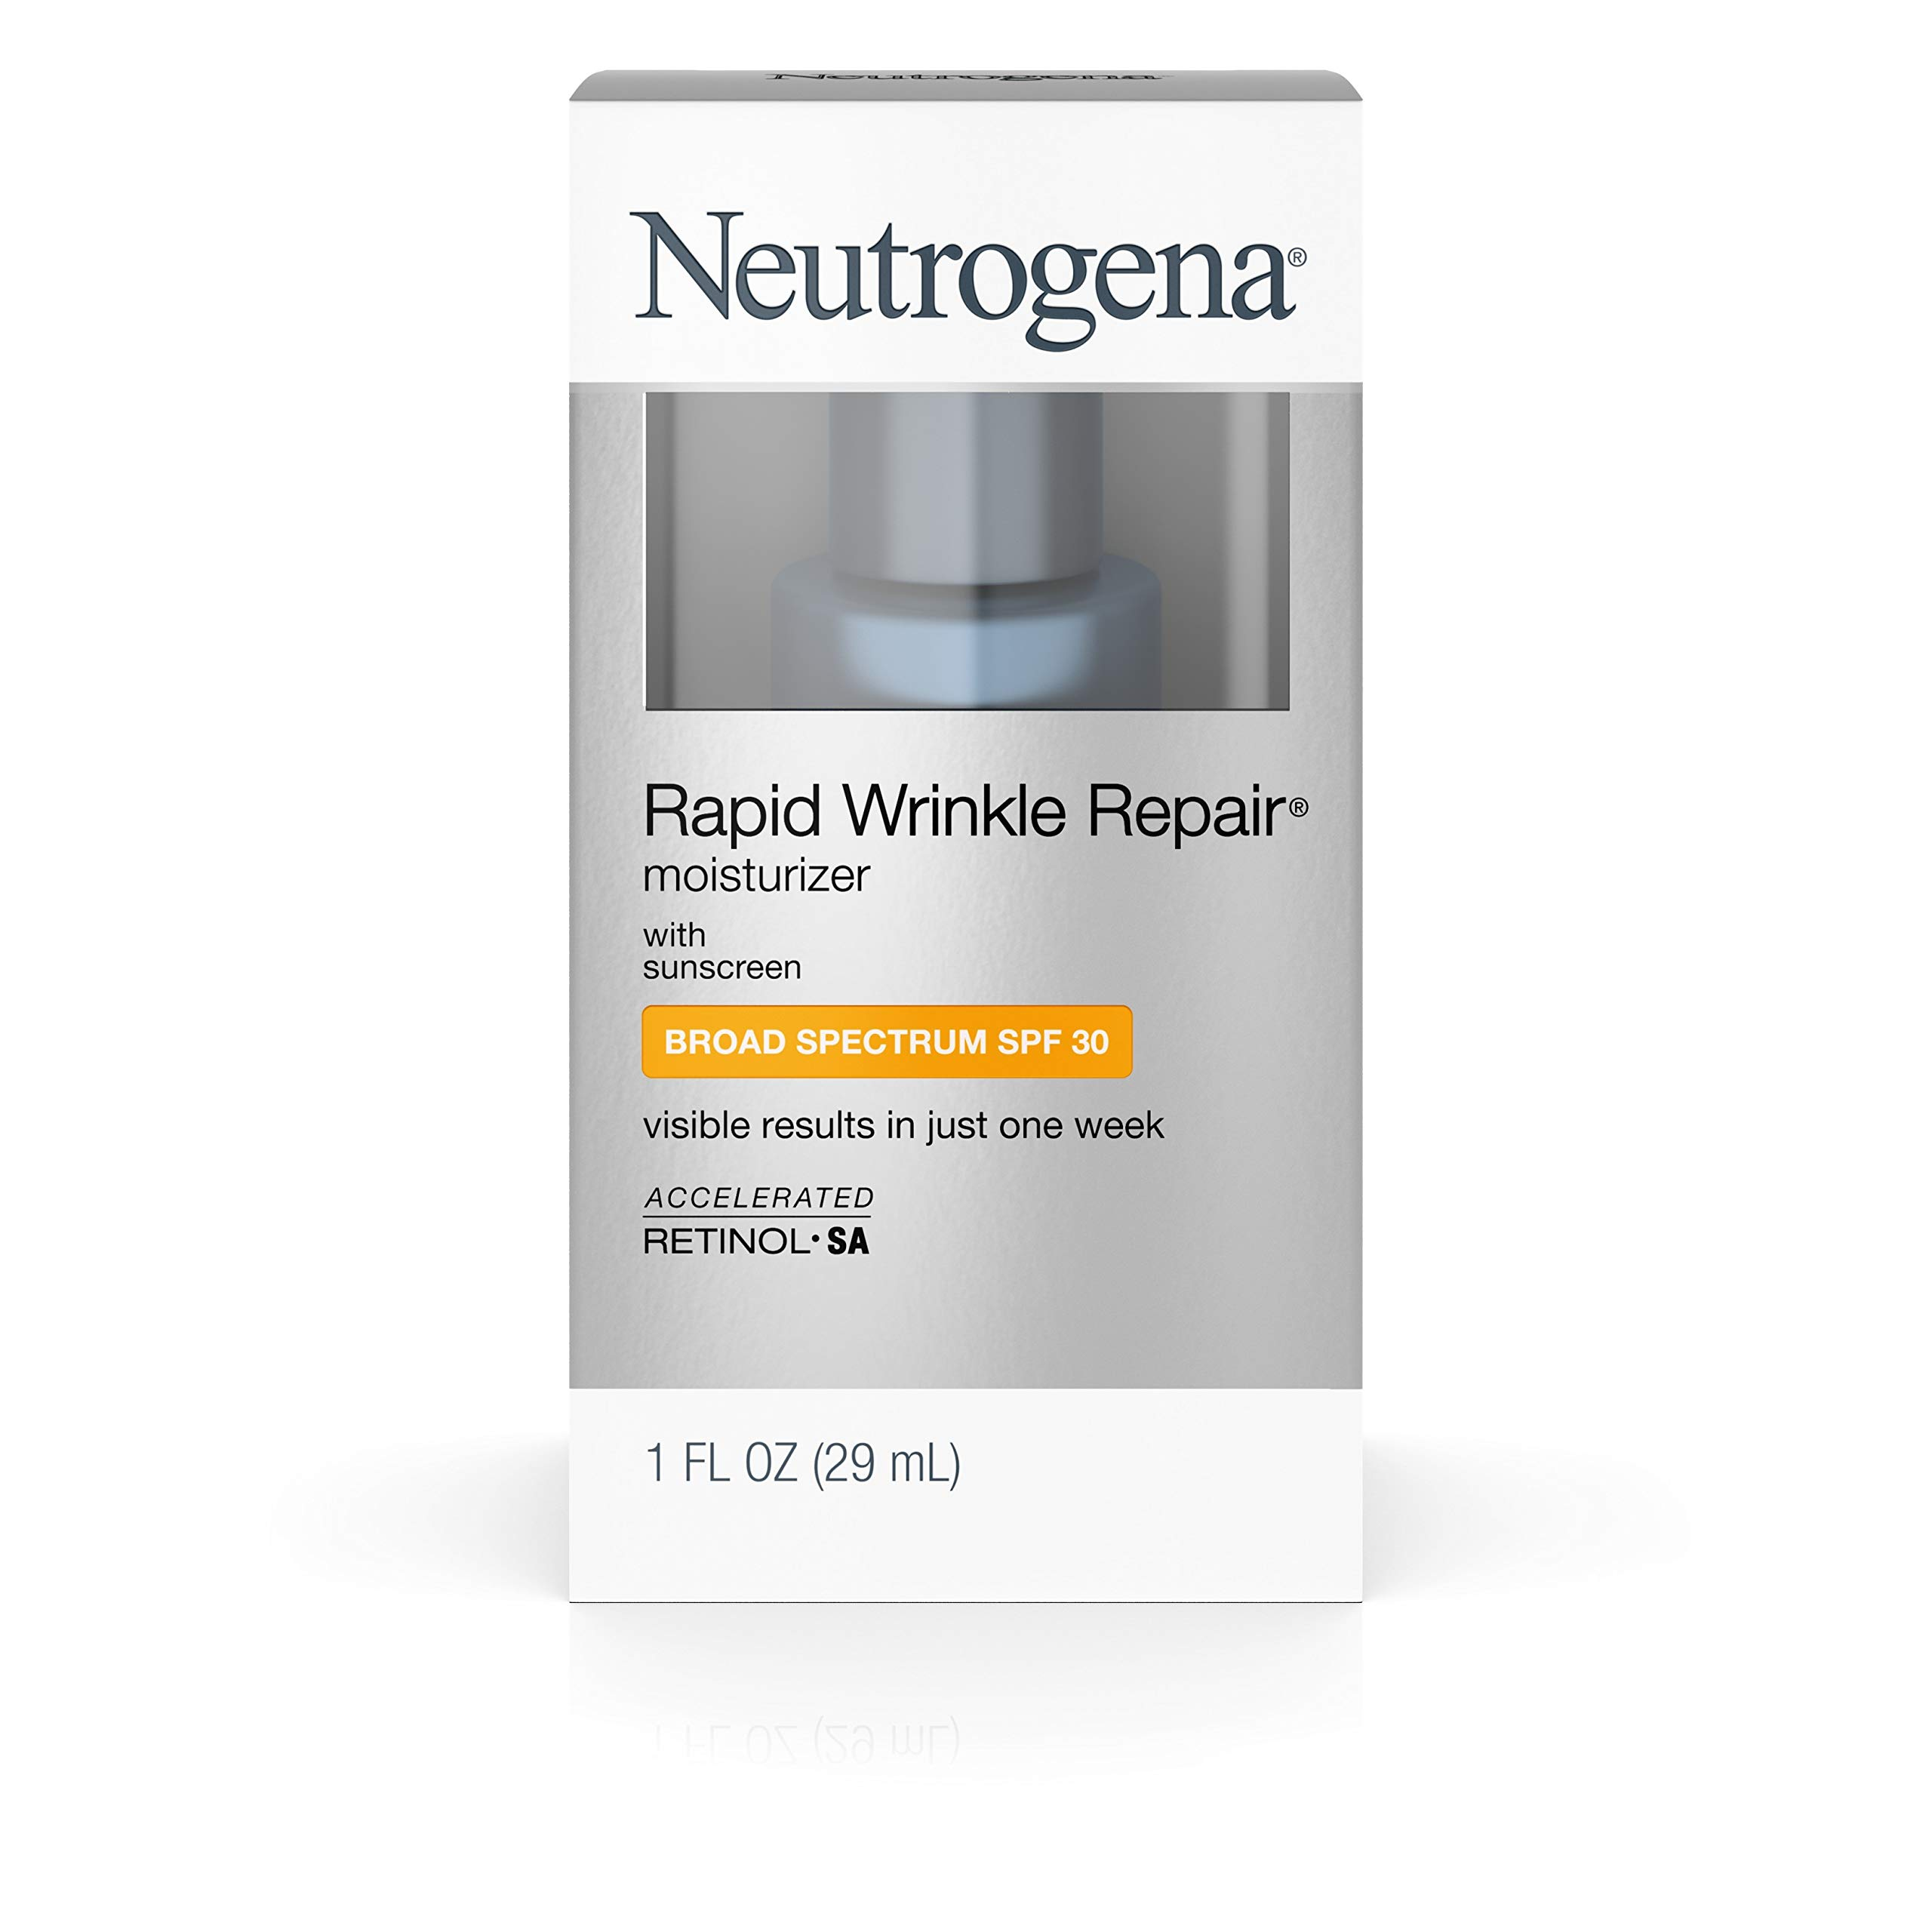 Neutrogena Rapid Wrinkle Repair Daily Hyaluronic Acid Retinol Face Moisturizer, Anti Wrinkle Face Cream & Neck Cream with SPF 30 Sunscreen - Hyaluronic Acid, Retinol & Glycerin with SPF 30, 1 fl. oz by Neutrogena